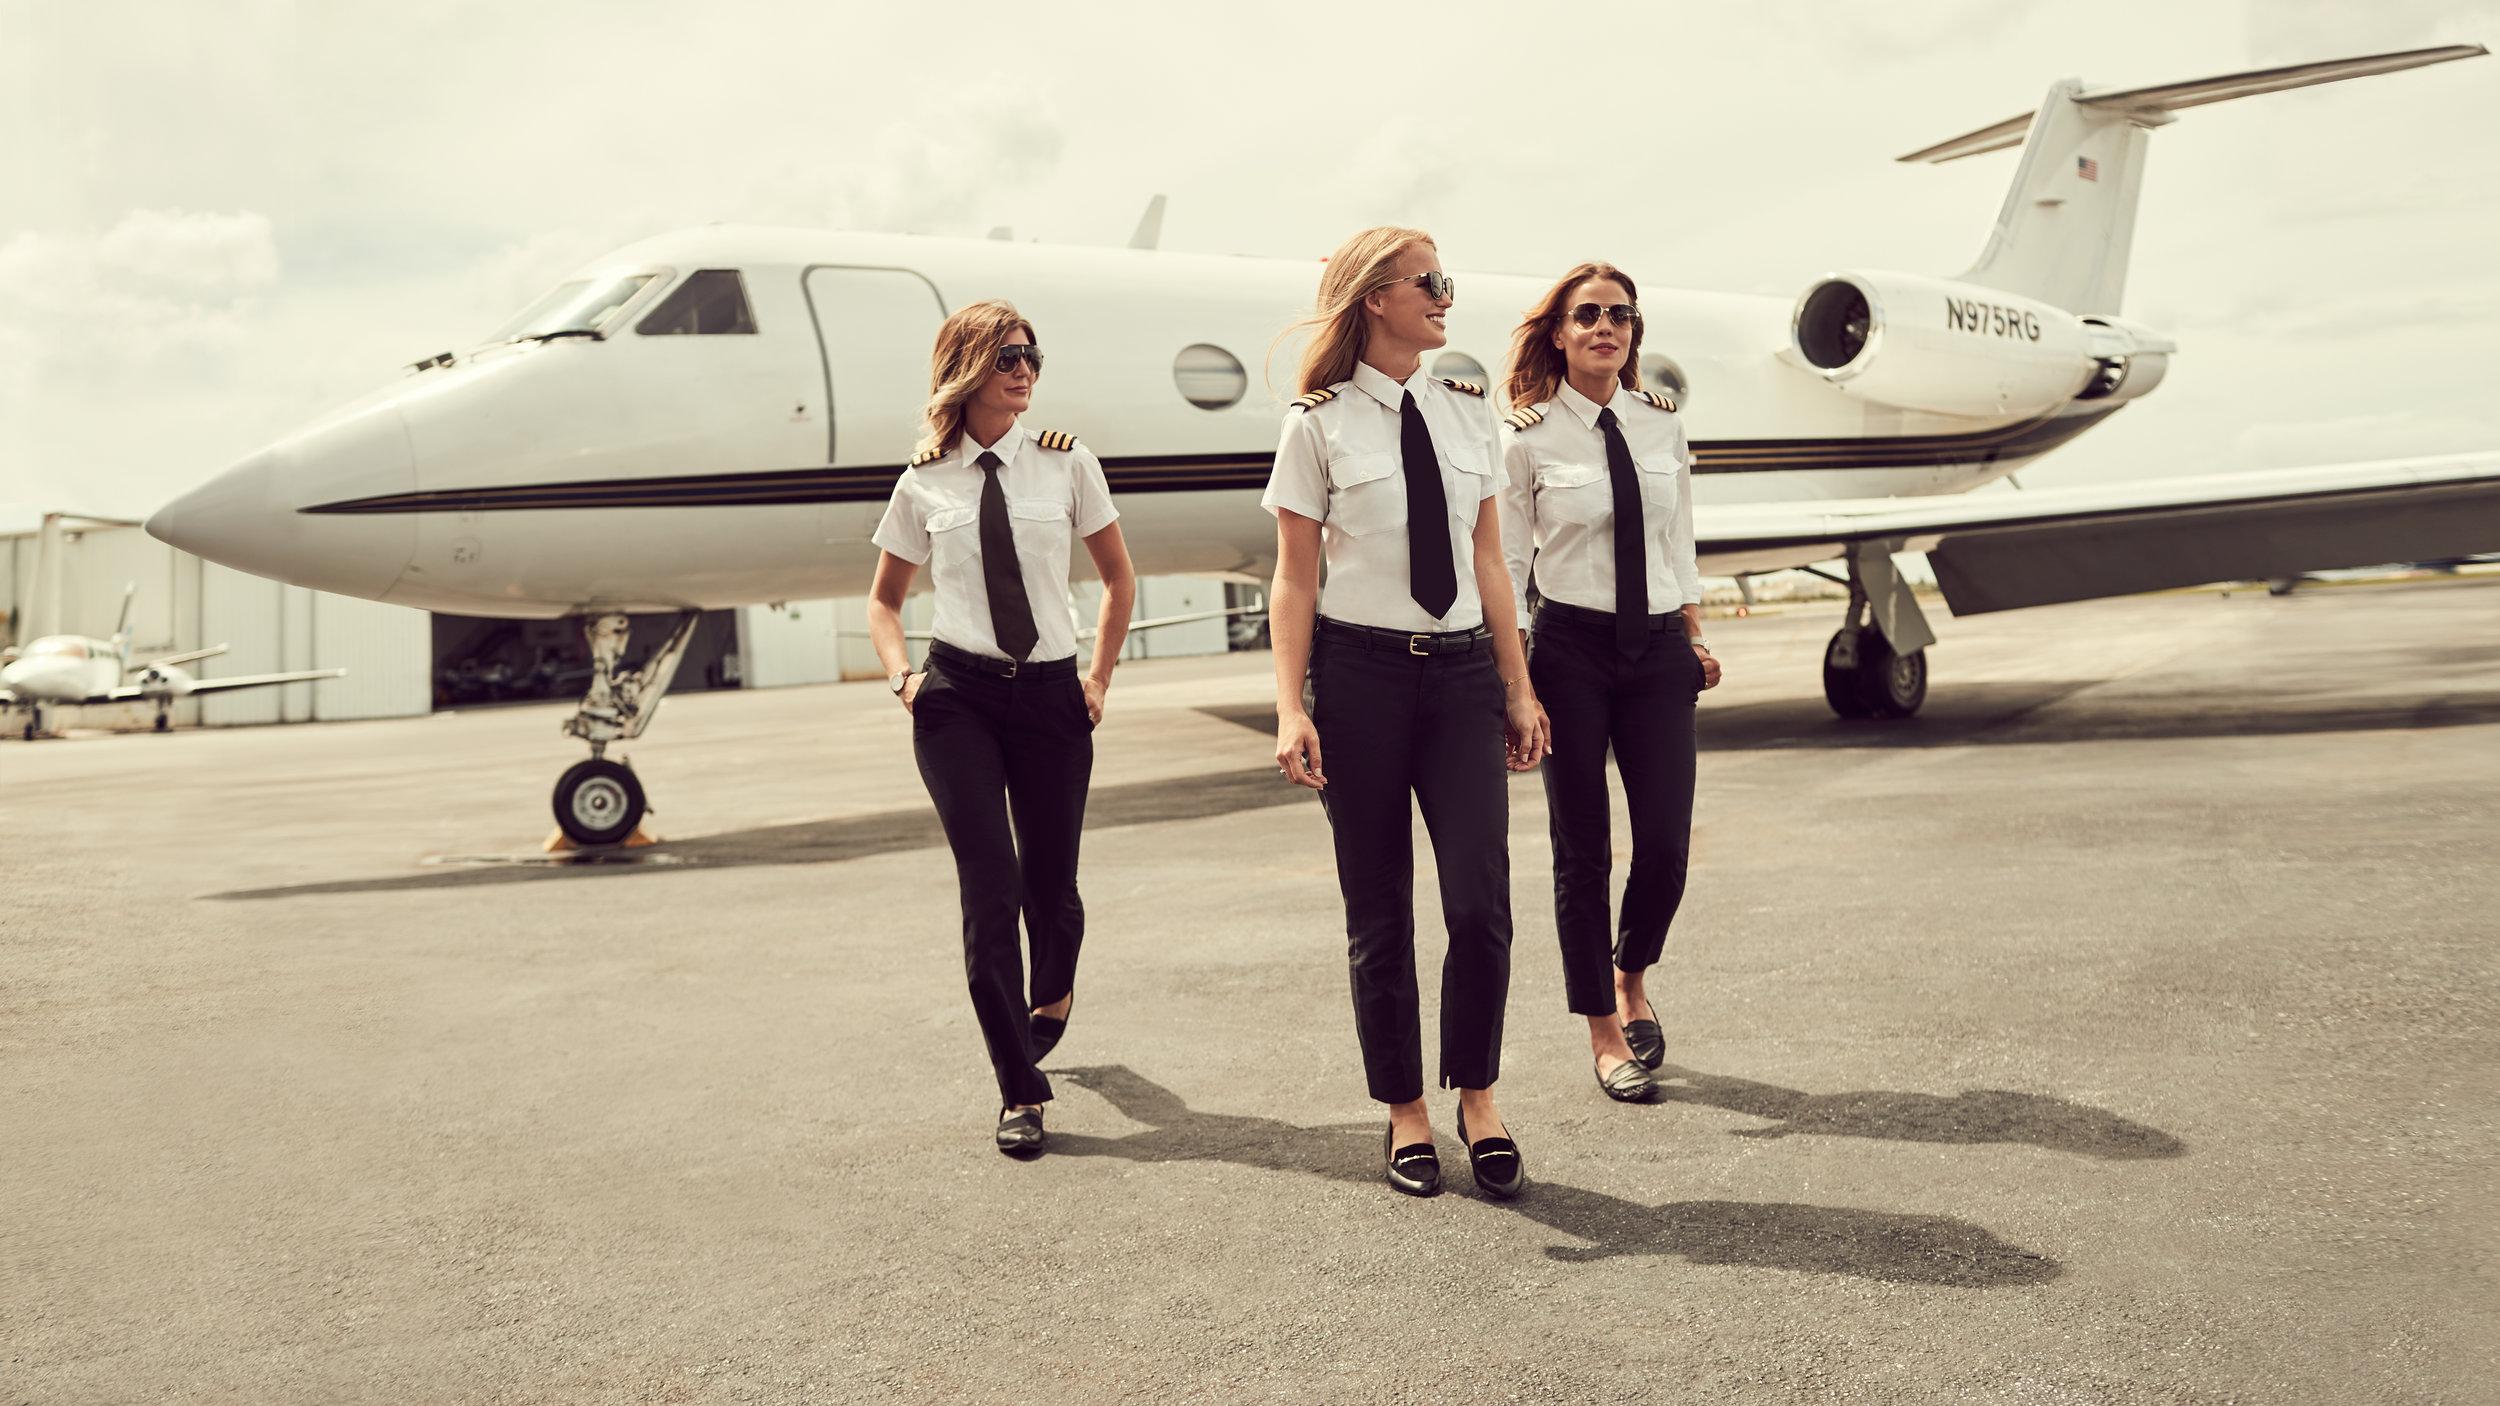 Copy of @pilotmaria, @flymalin, @mariathepilot for Carrera x ELLE